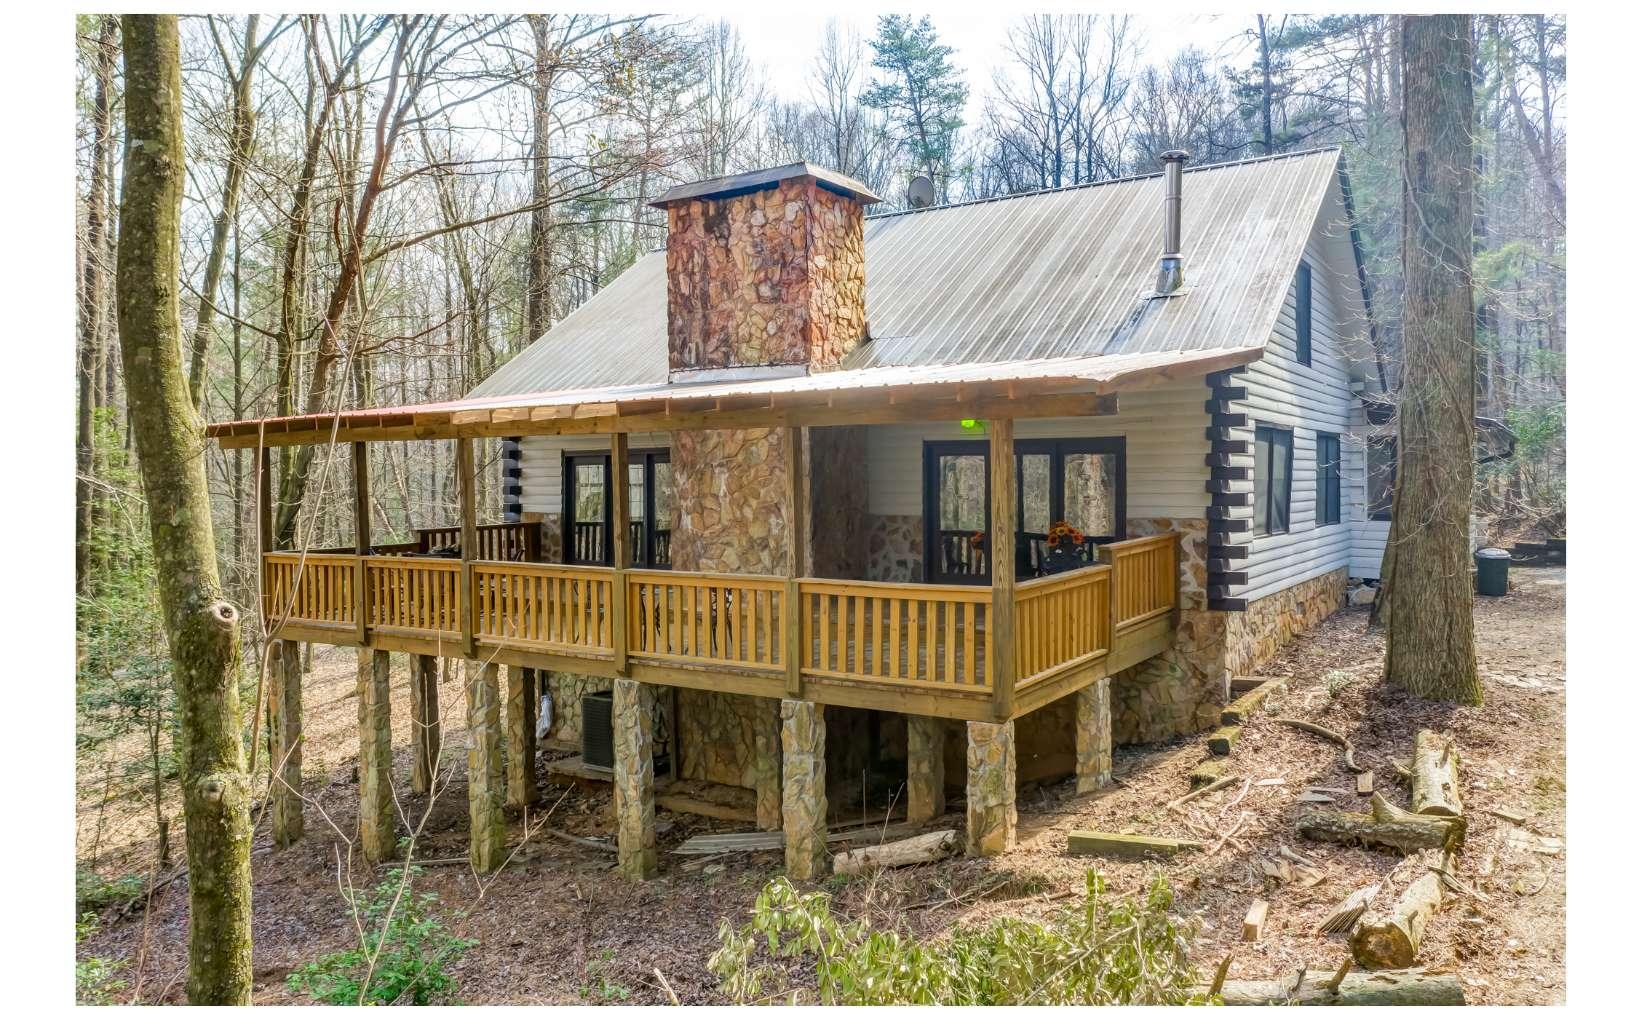 511 HARPER VALLEY RD, Ellijay, Georgia 30540, 6 Bedrooms Bedrooms, ,3 BathroomsBathrooms,Single Family,For Sale,511 HARPER VALLEY RD,305211